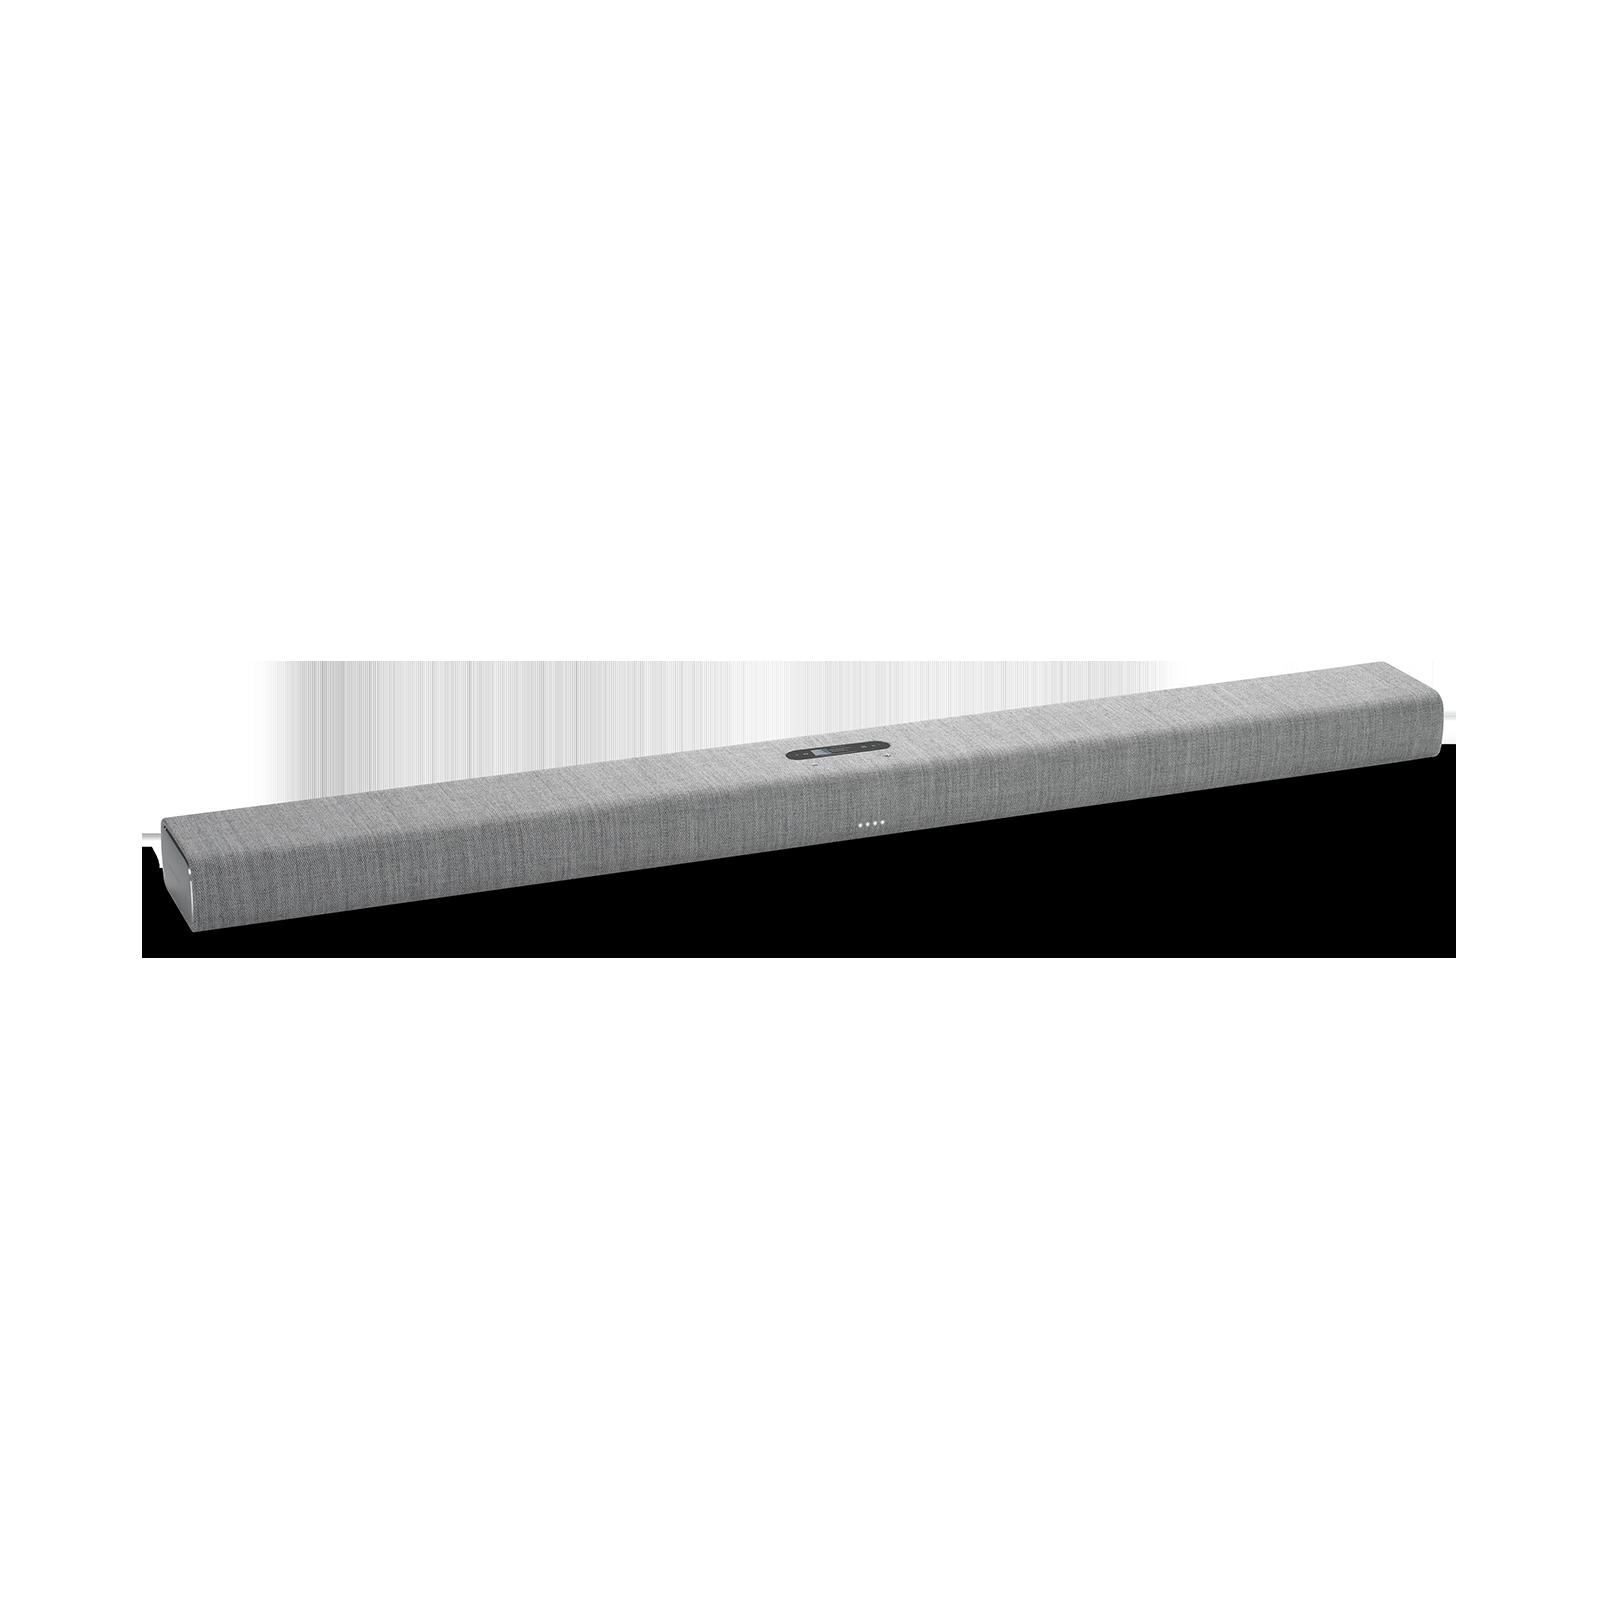 Harman Kardon Citation Bar - Grey - The smartest soundbar for movies and music - Hero